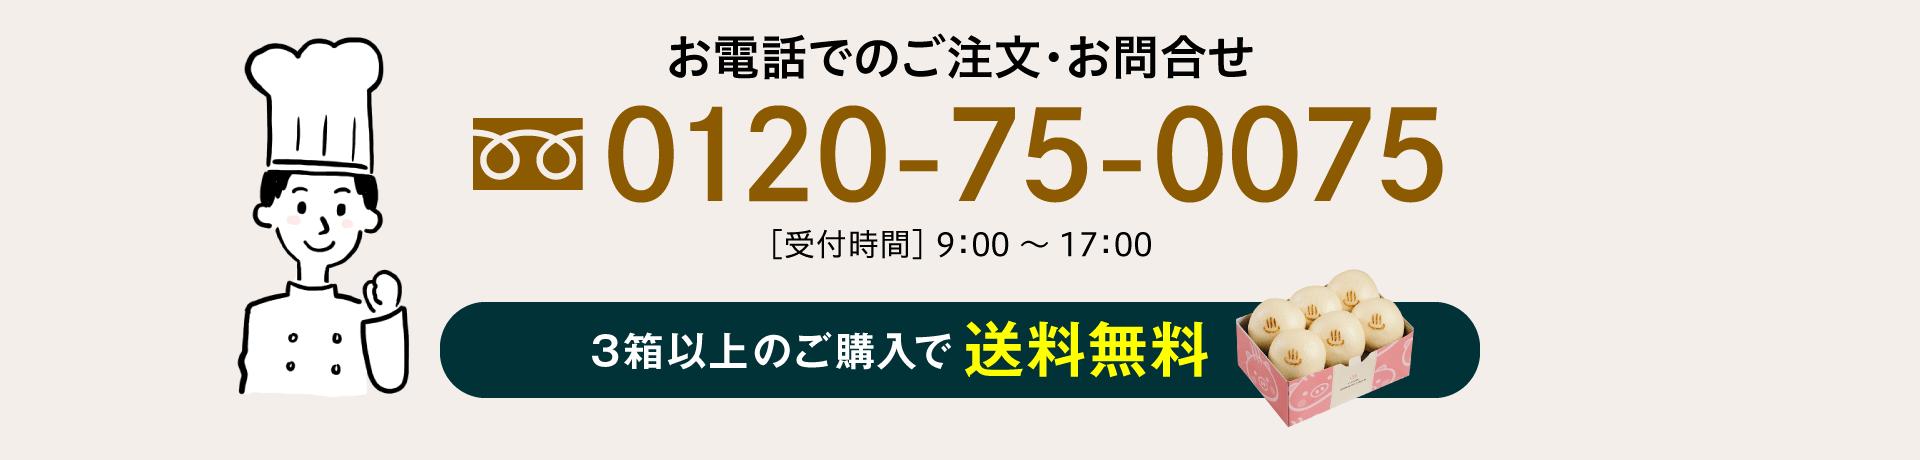 0120-75-0075